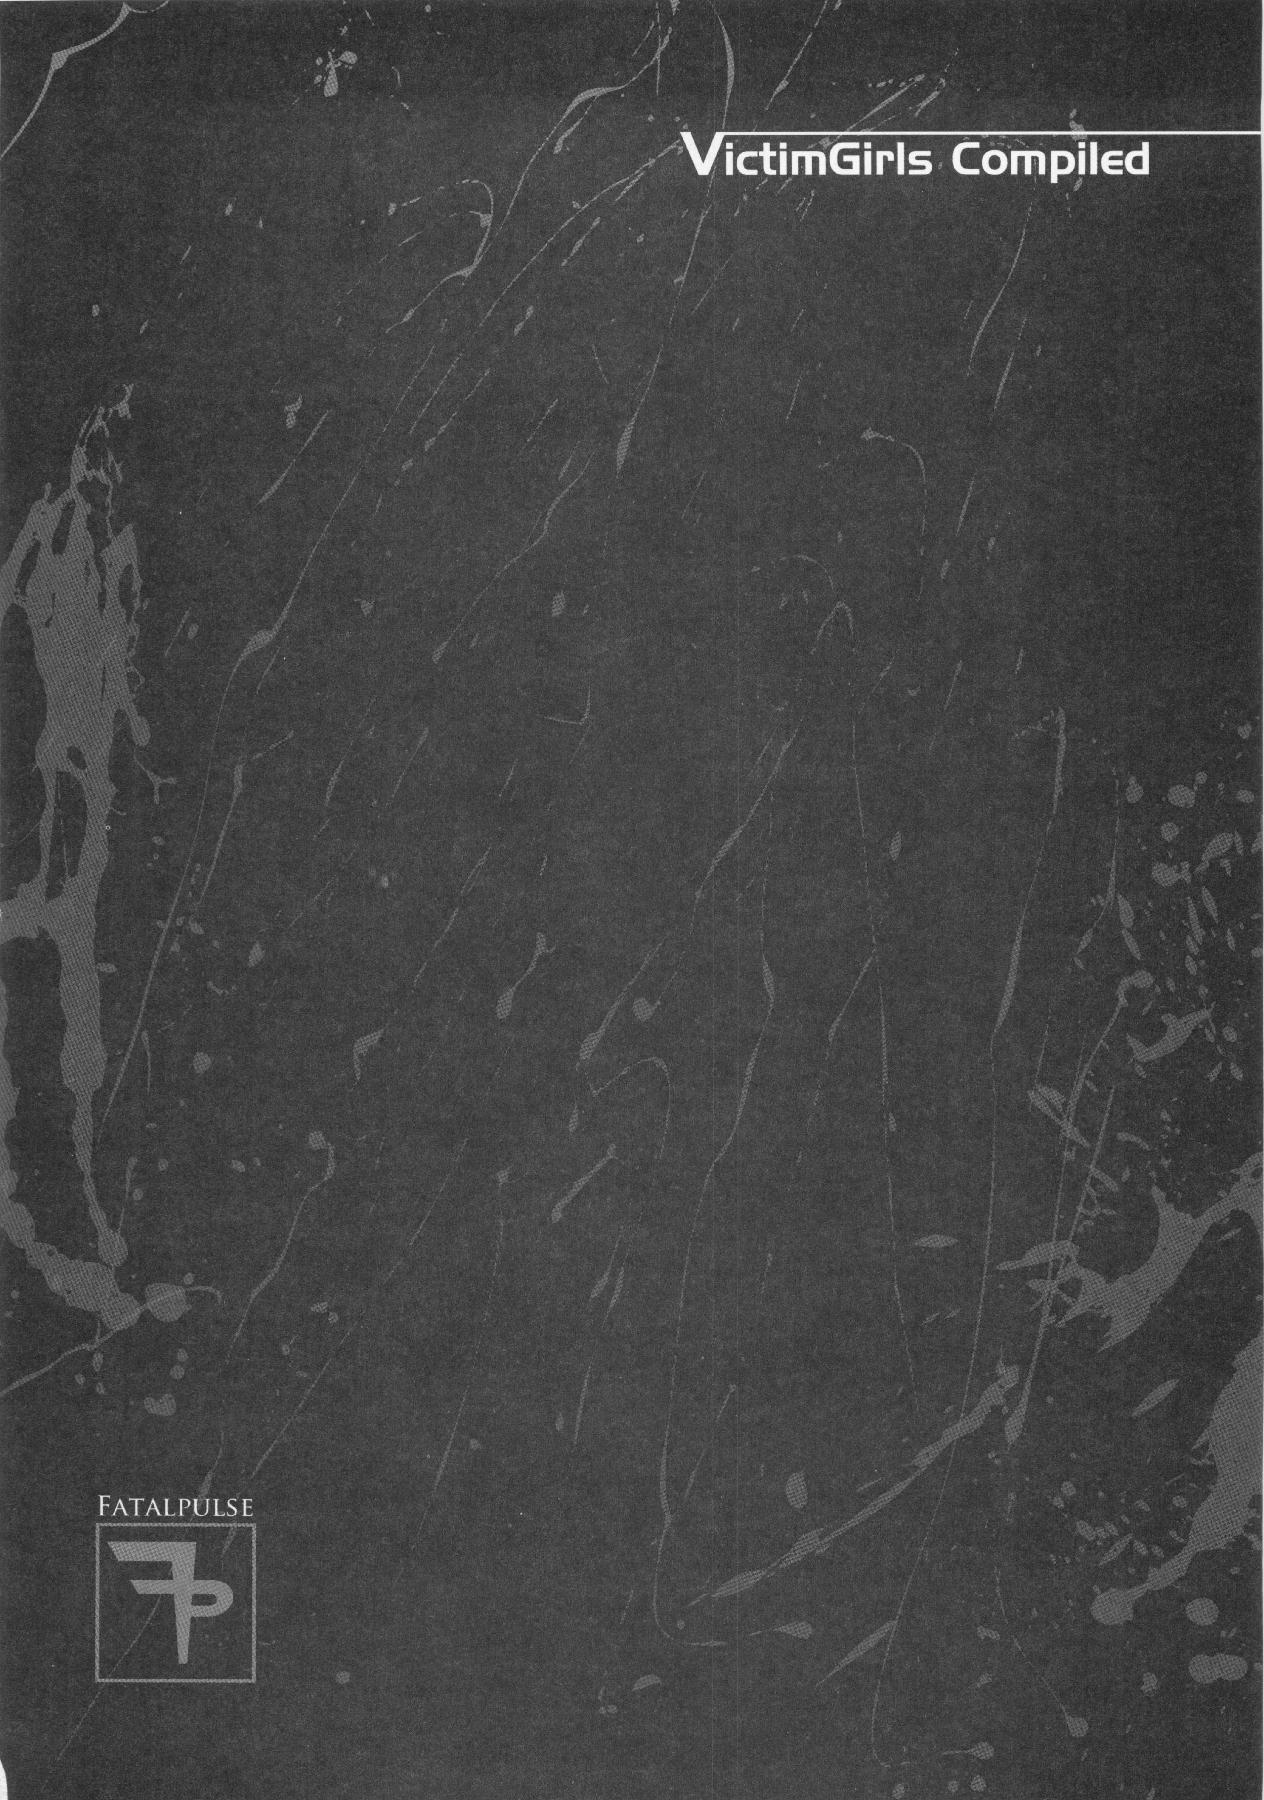 (C83) [Fatalpulse (Asanagi)] VictimGirls Compiled Vol.1 -Victimgirls Soushuuhen 1- MMO Game Selection (Various) 52